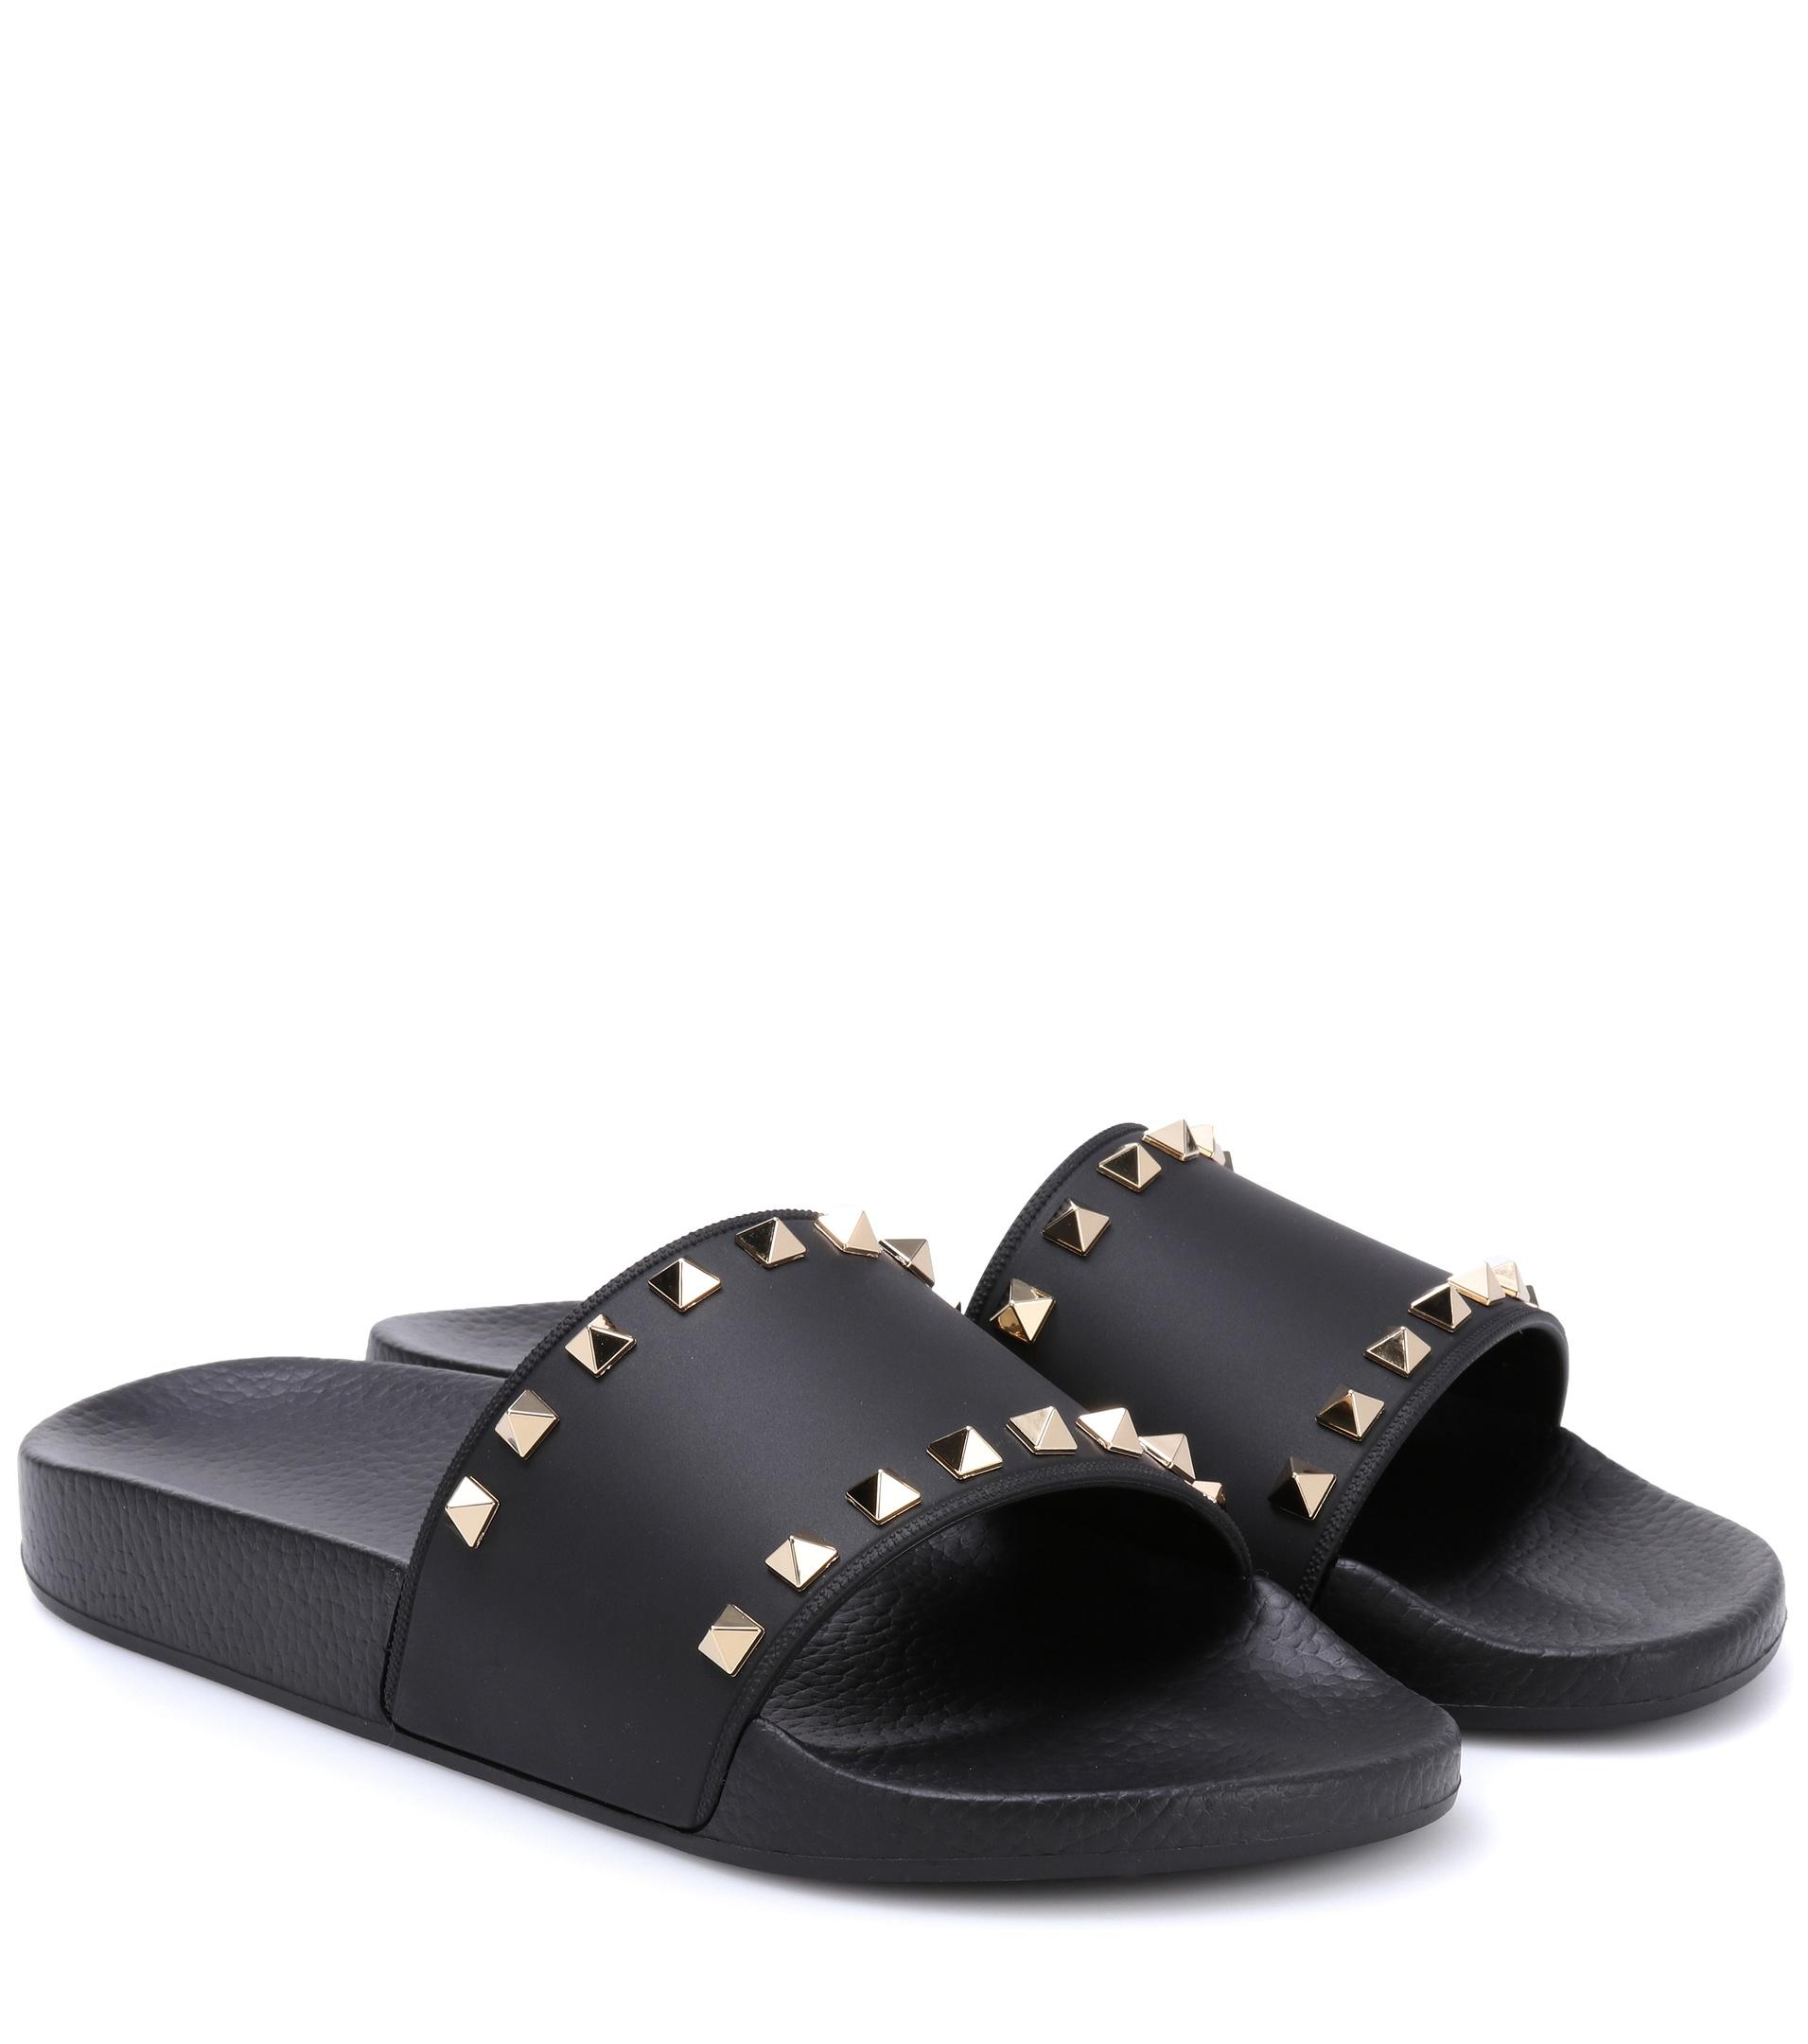 Lyst Valentino Garavani Rockstud Slides In Black